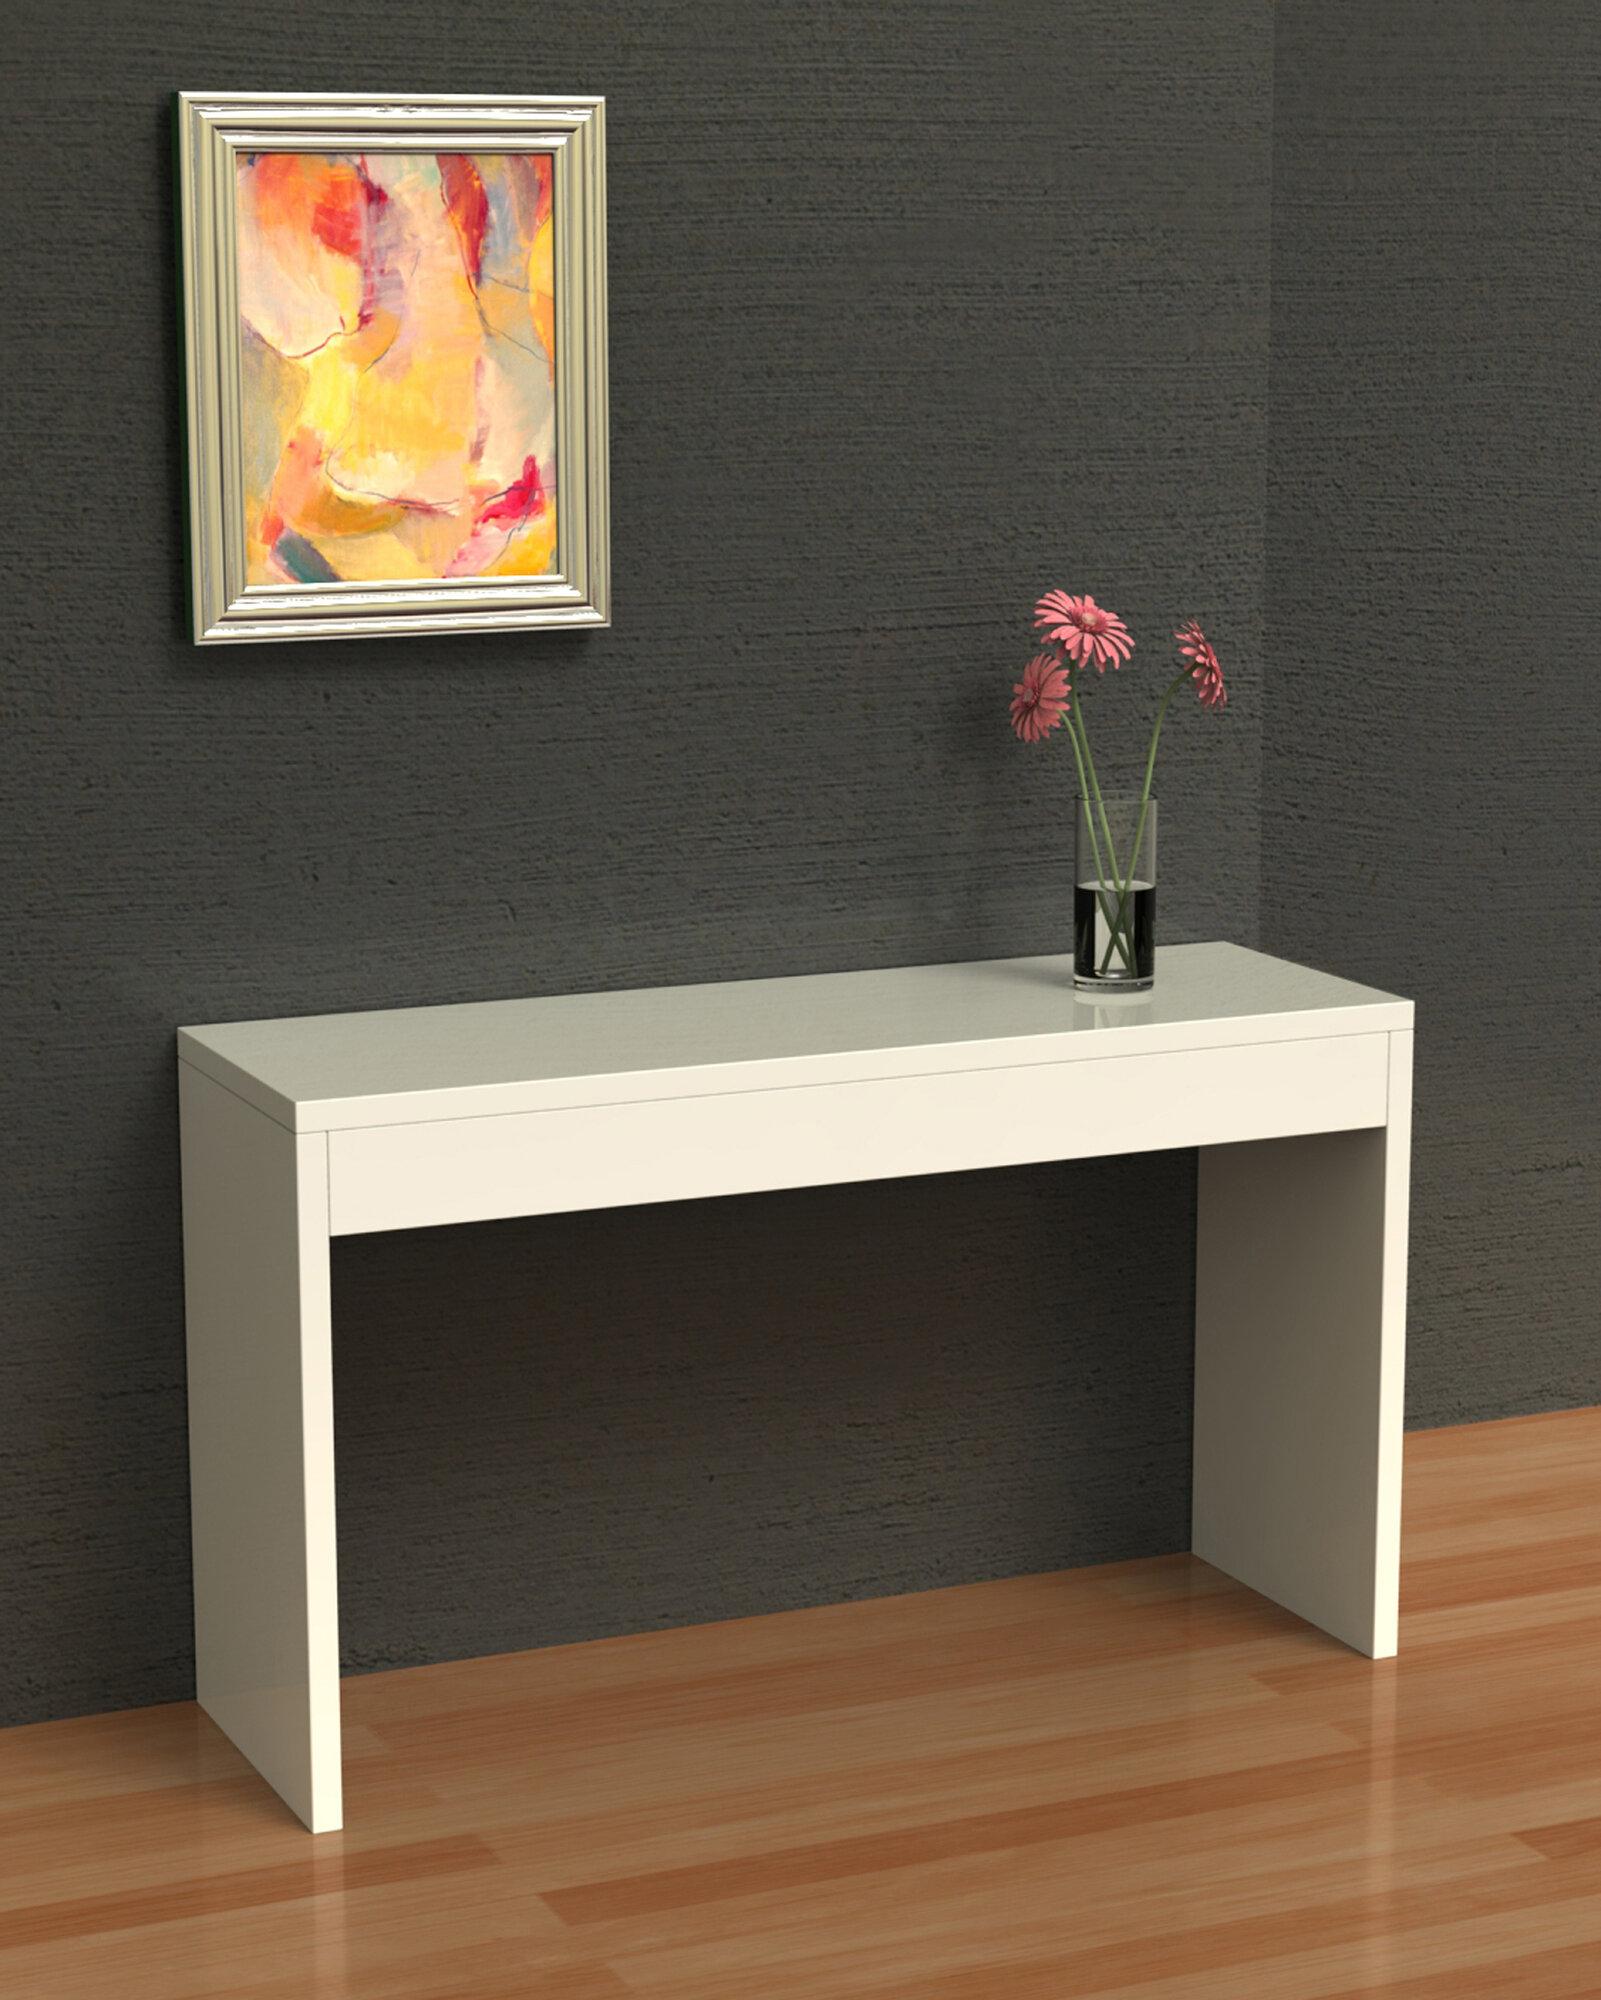 title | Modern Foyer Table